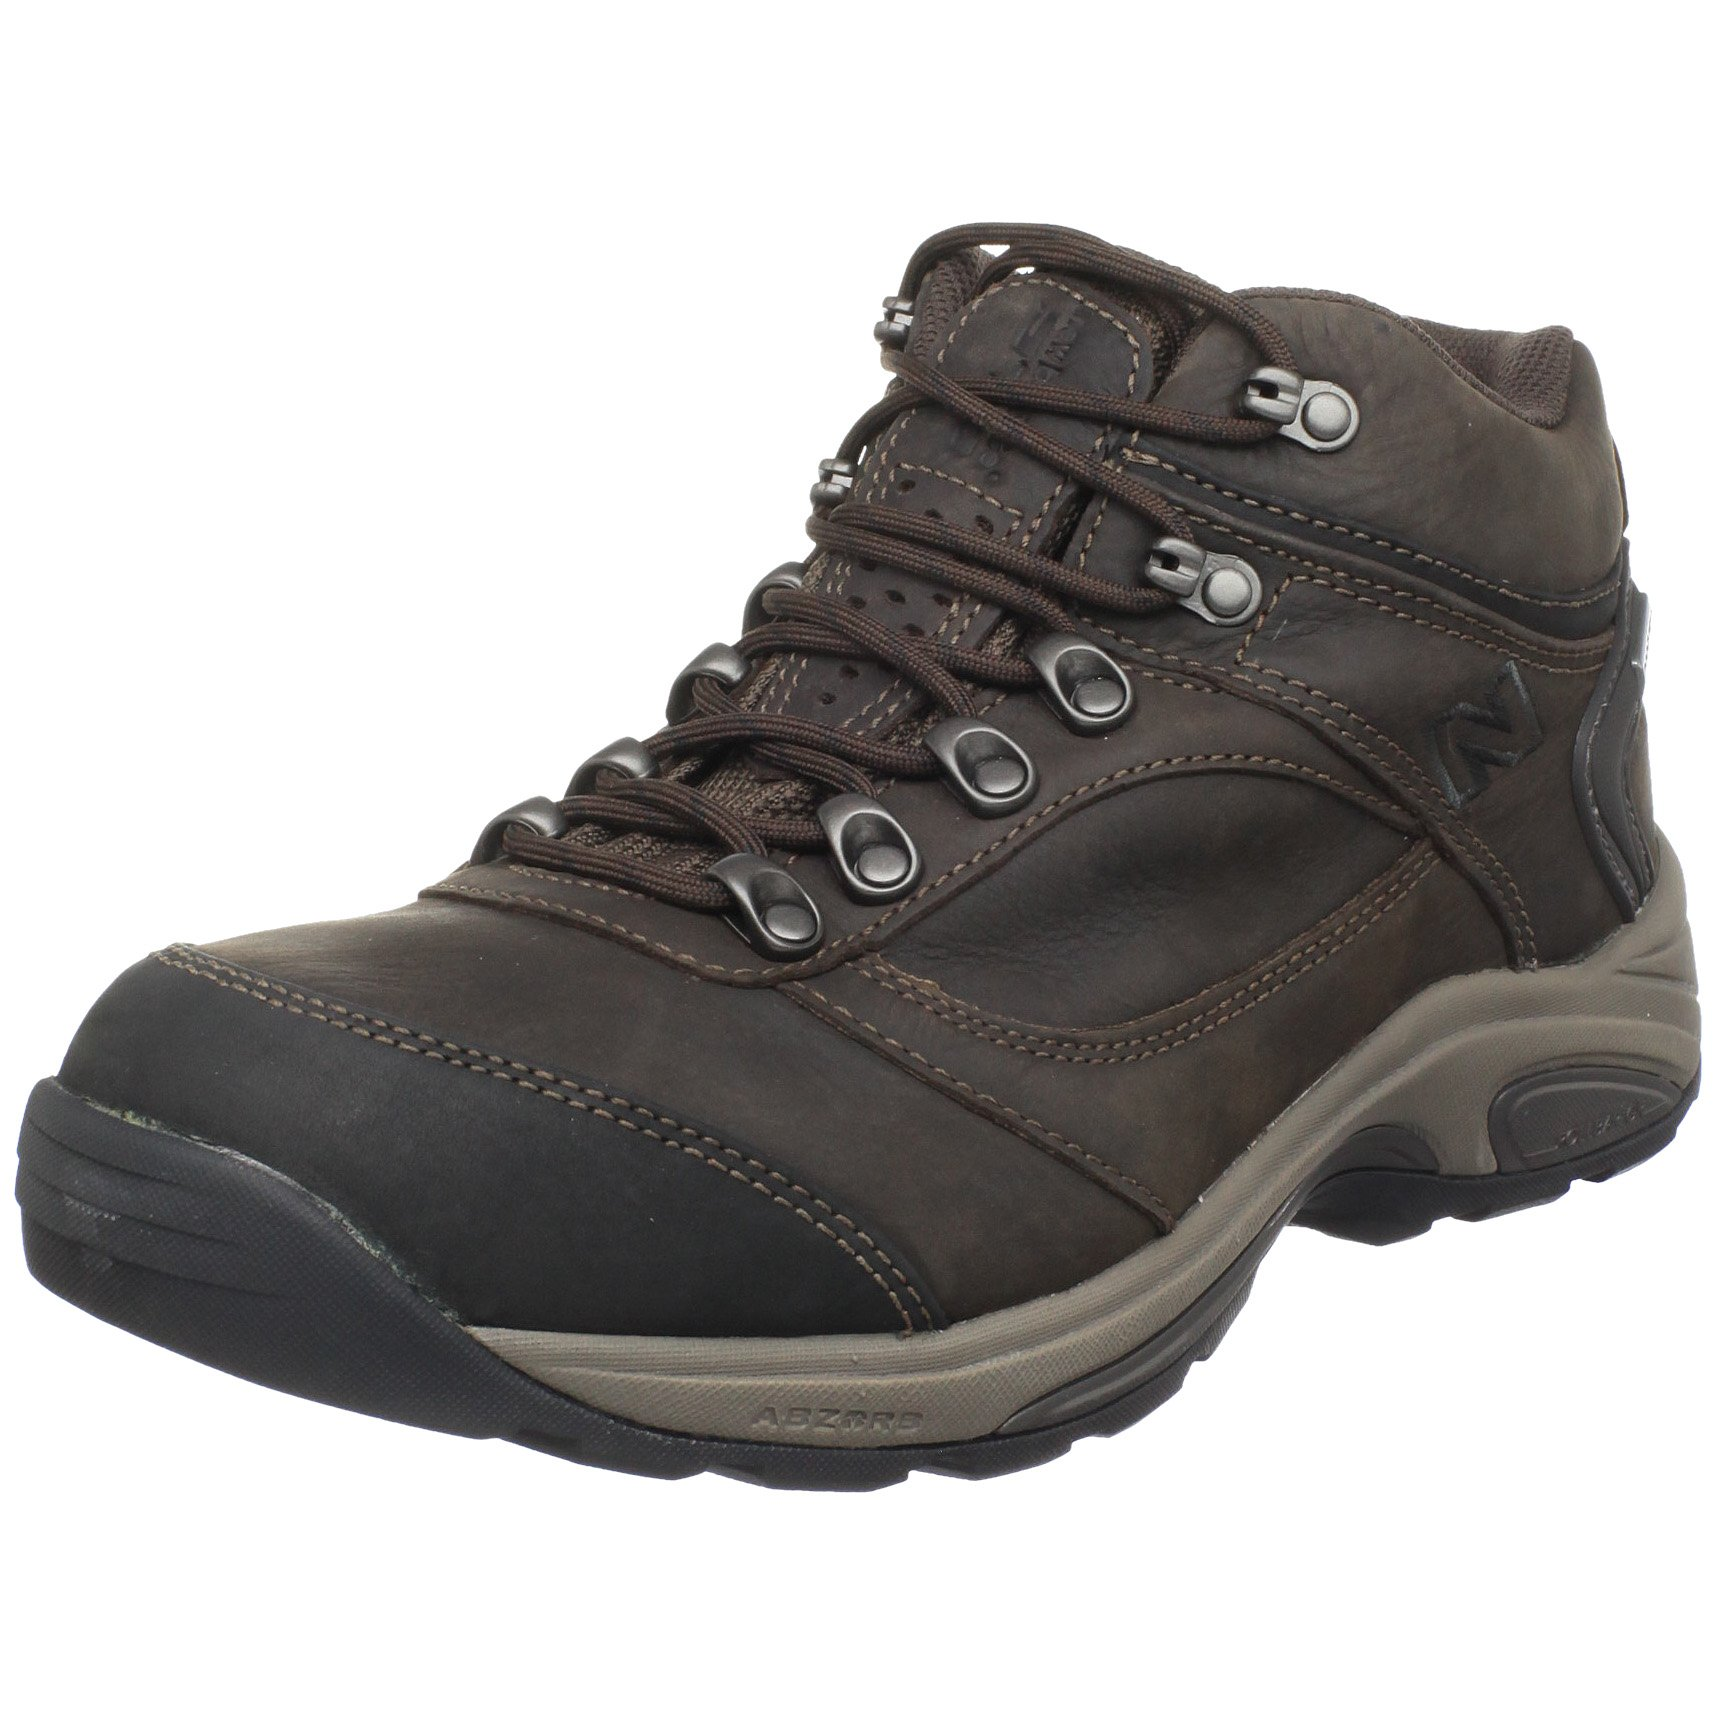 New Balance Men's MW978 Walking Shoe, Brown, 11.5 4E US by New Balance